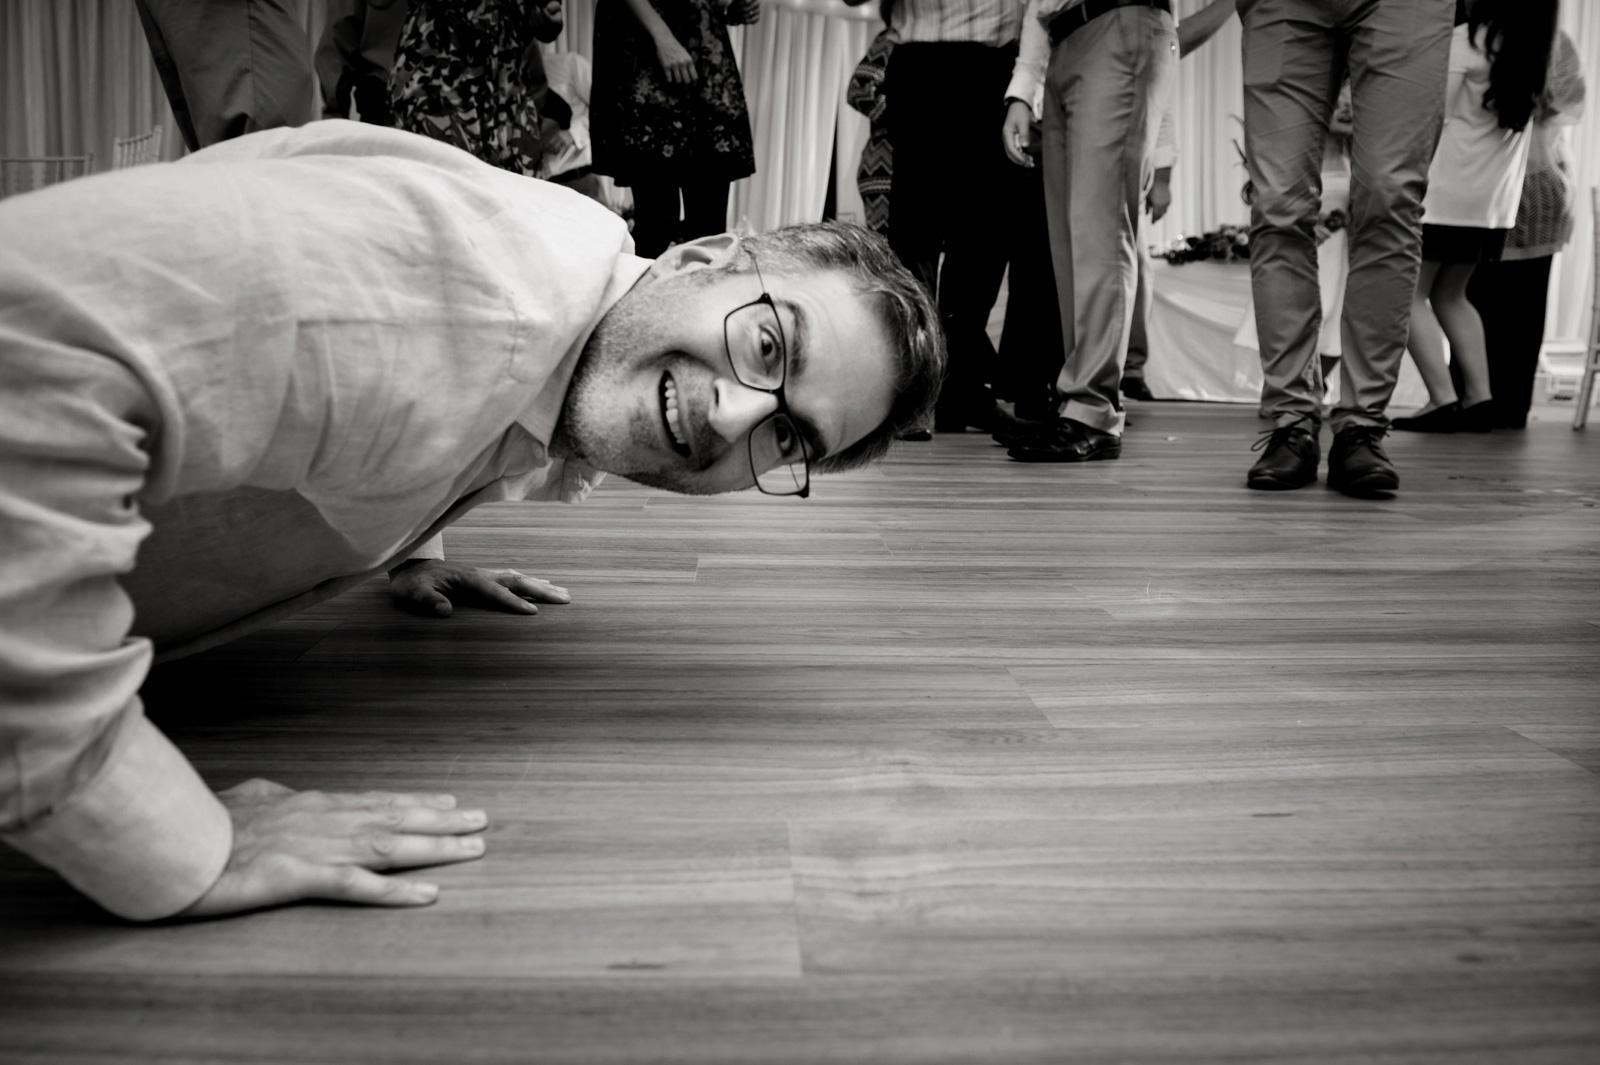 man peeking into camera on floor